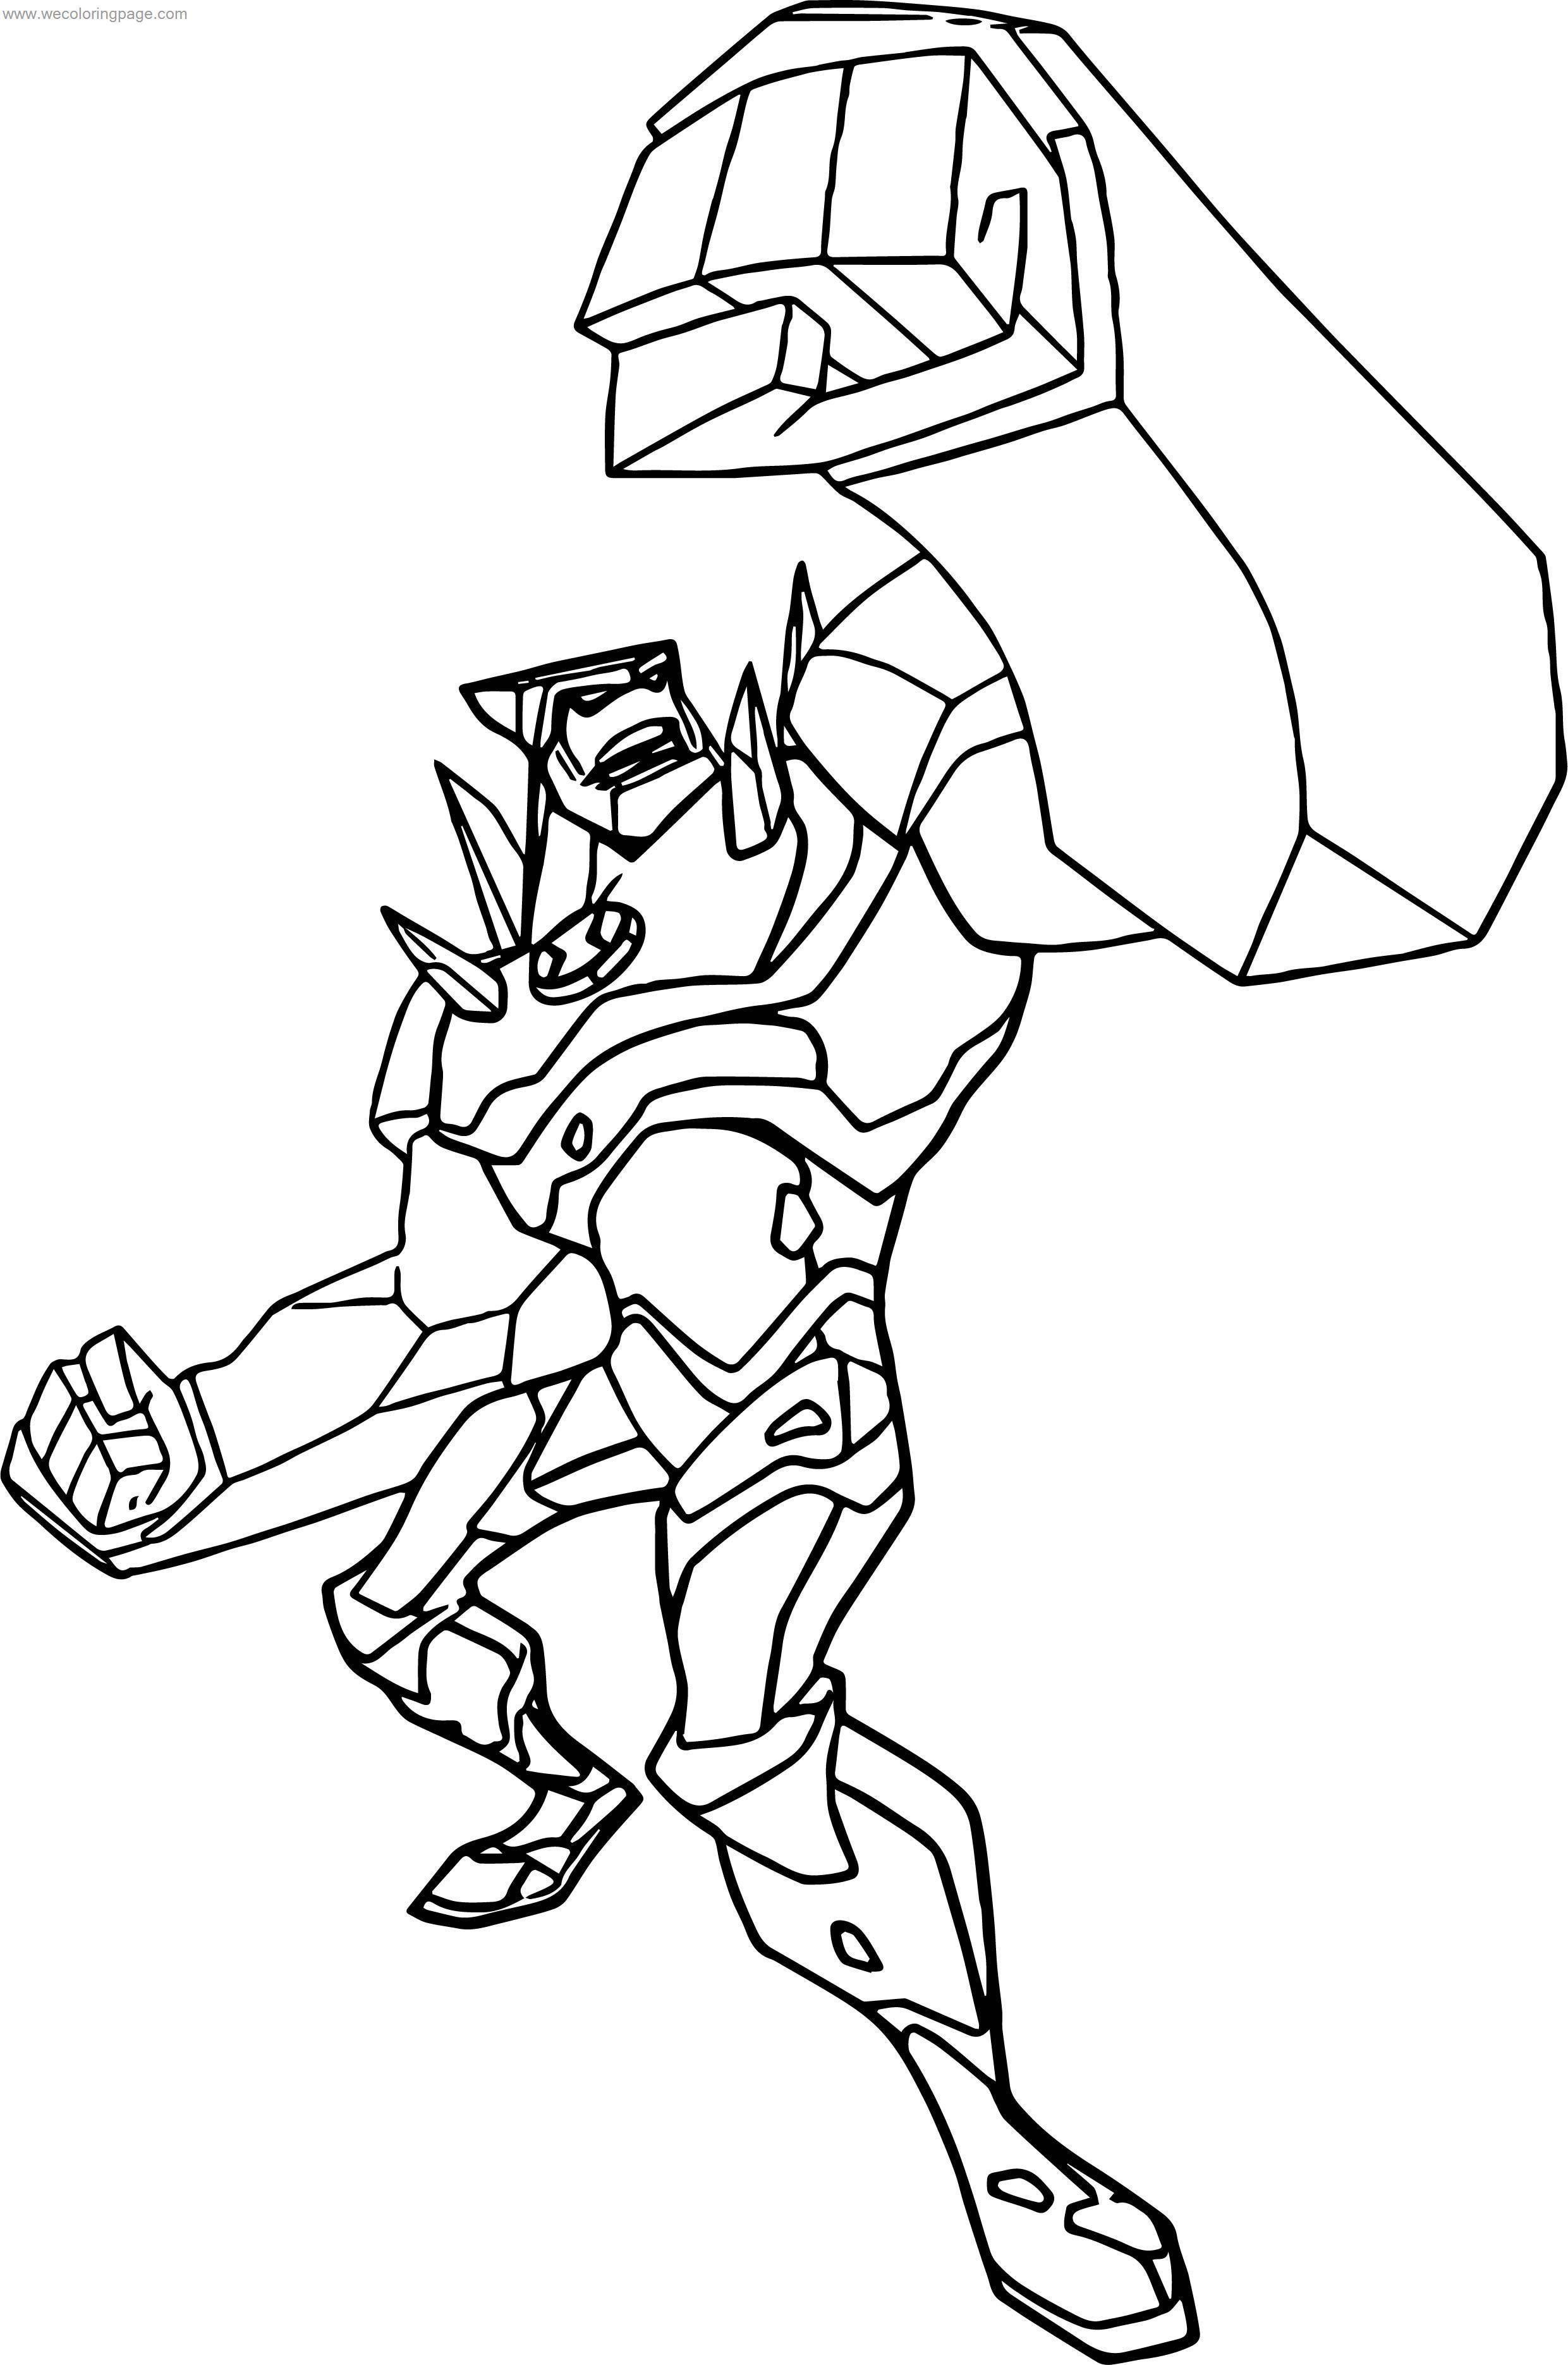 Benten Punch Creature Coloring Page